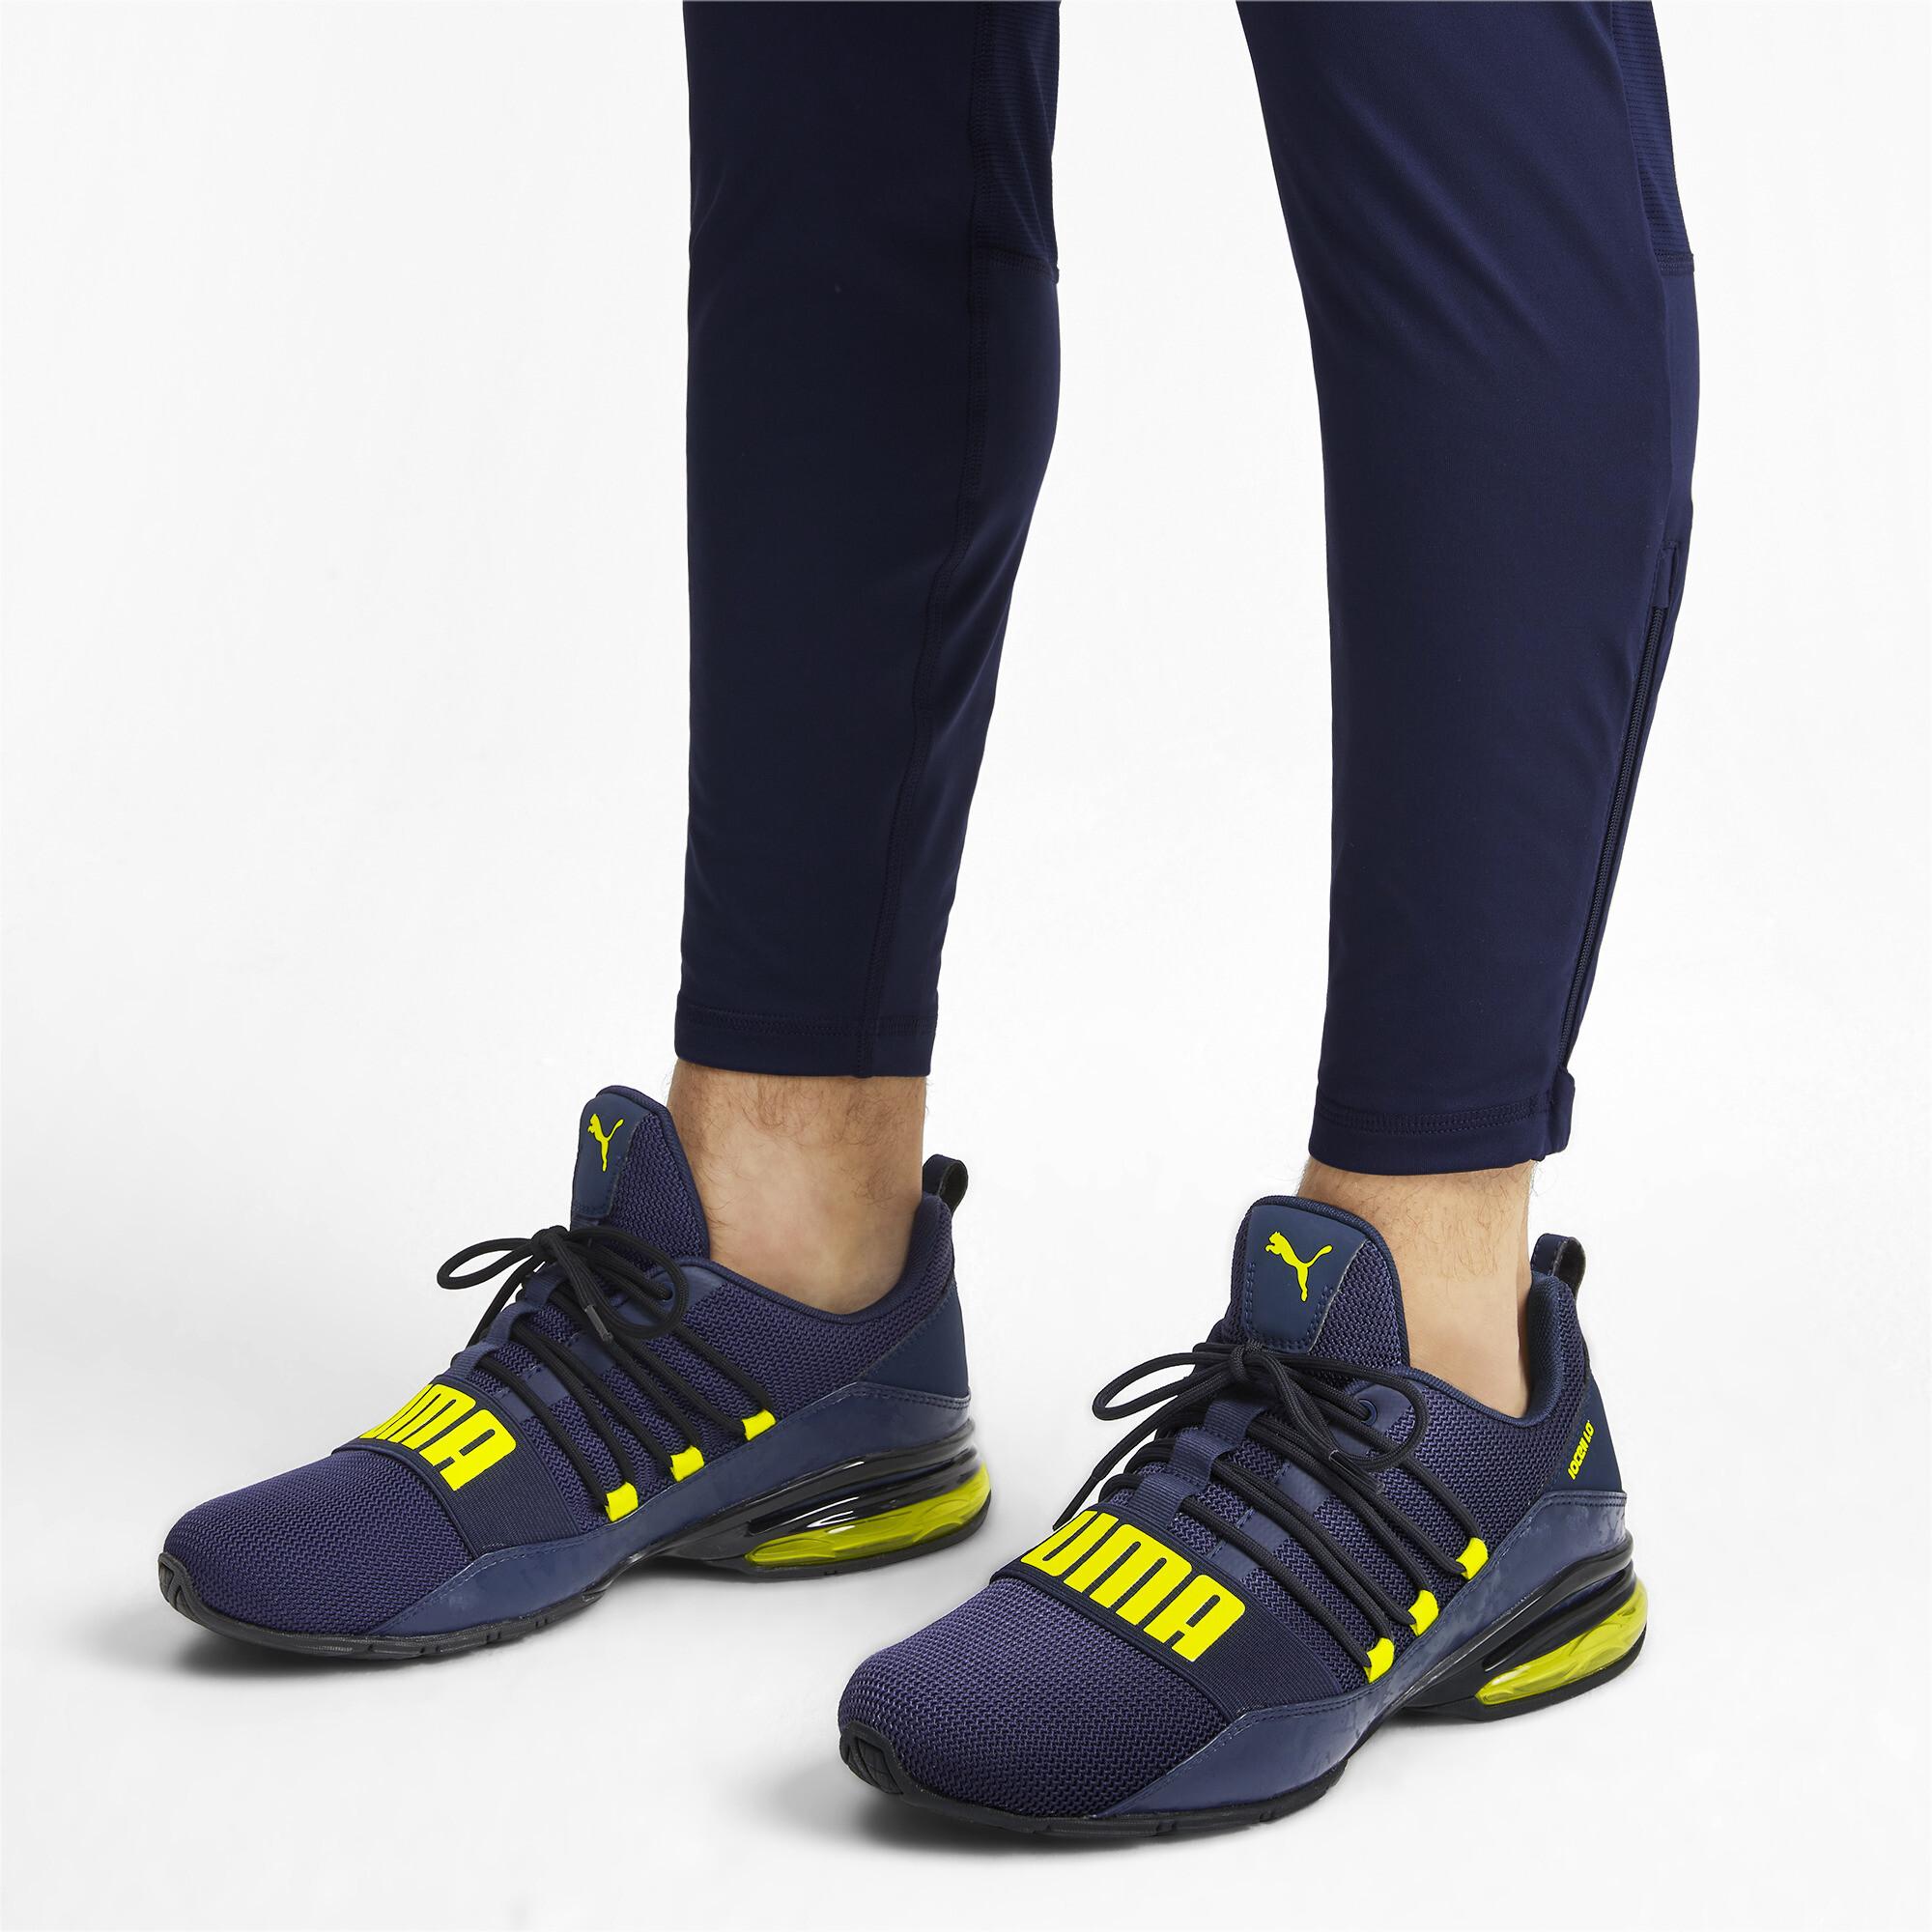 PUMA-CELL-Regulate-Camo-Men-s-Training-Shoes-Men-Shoe-Running thumbnail 12